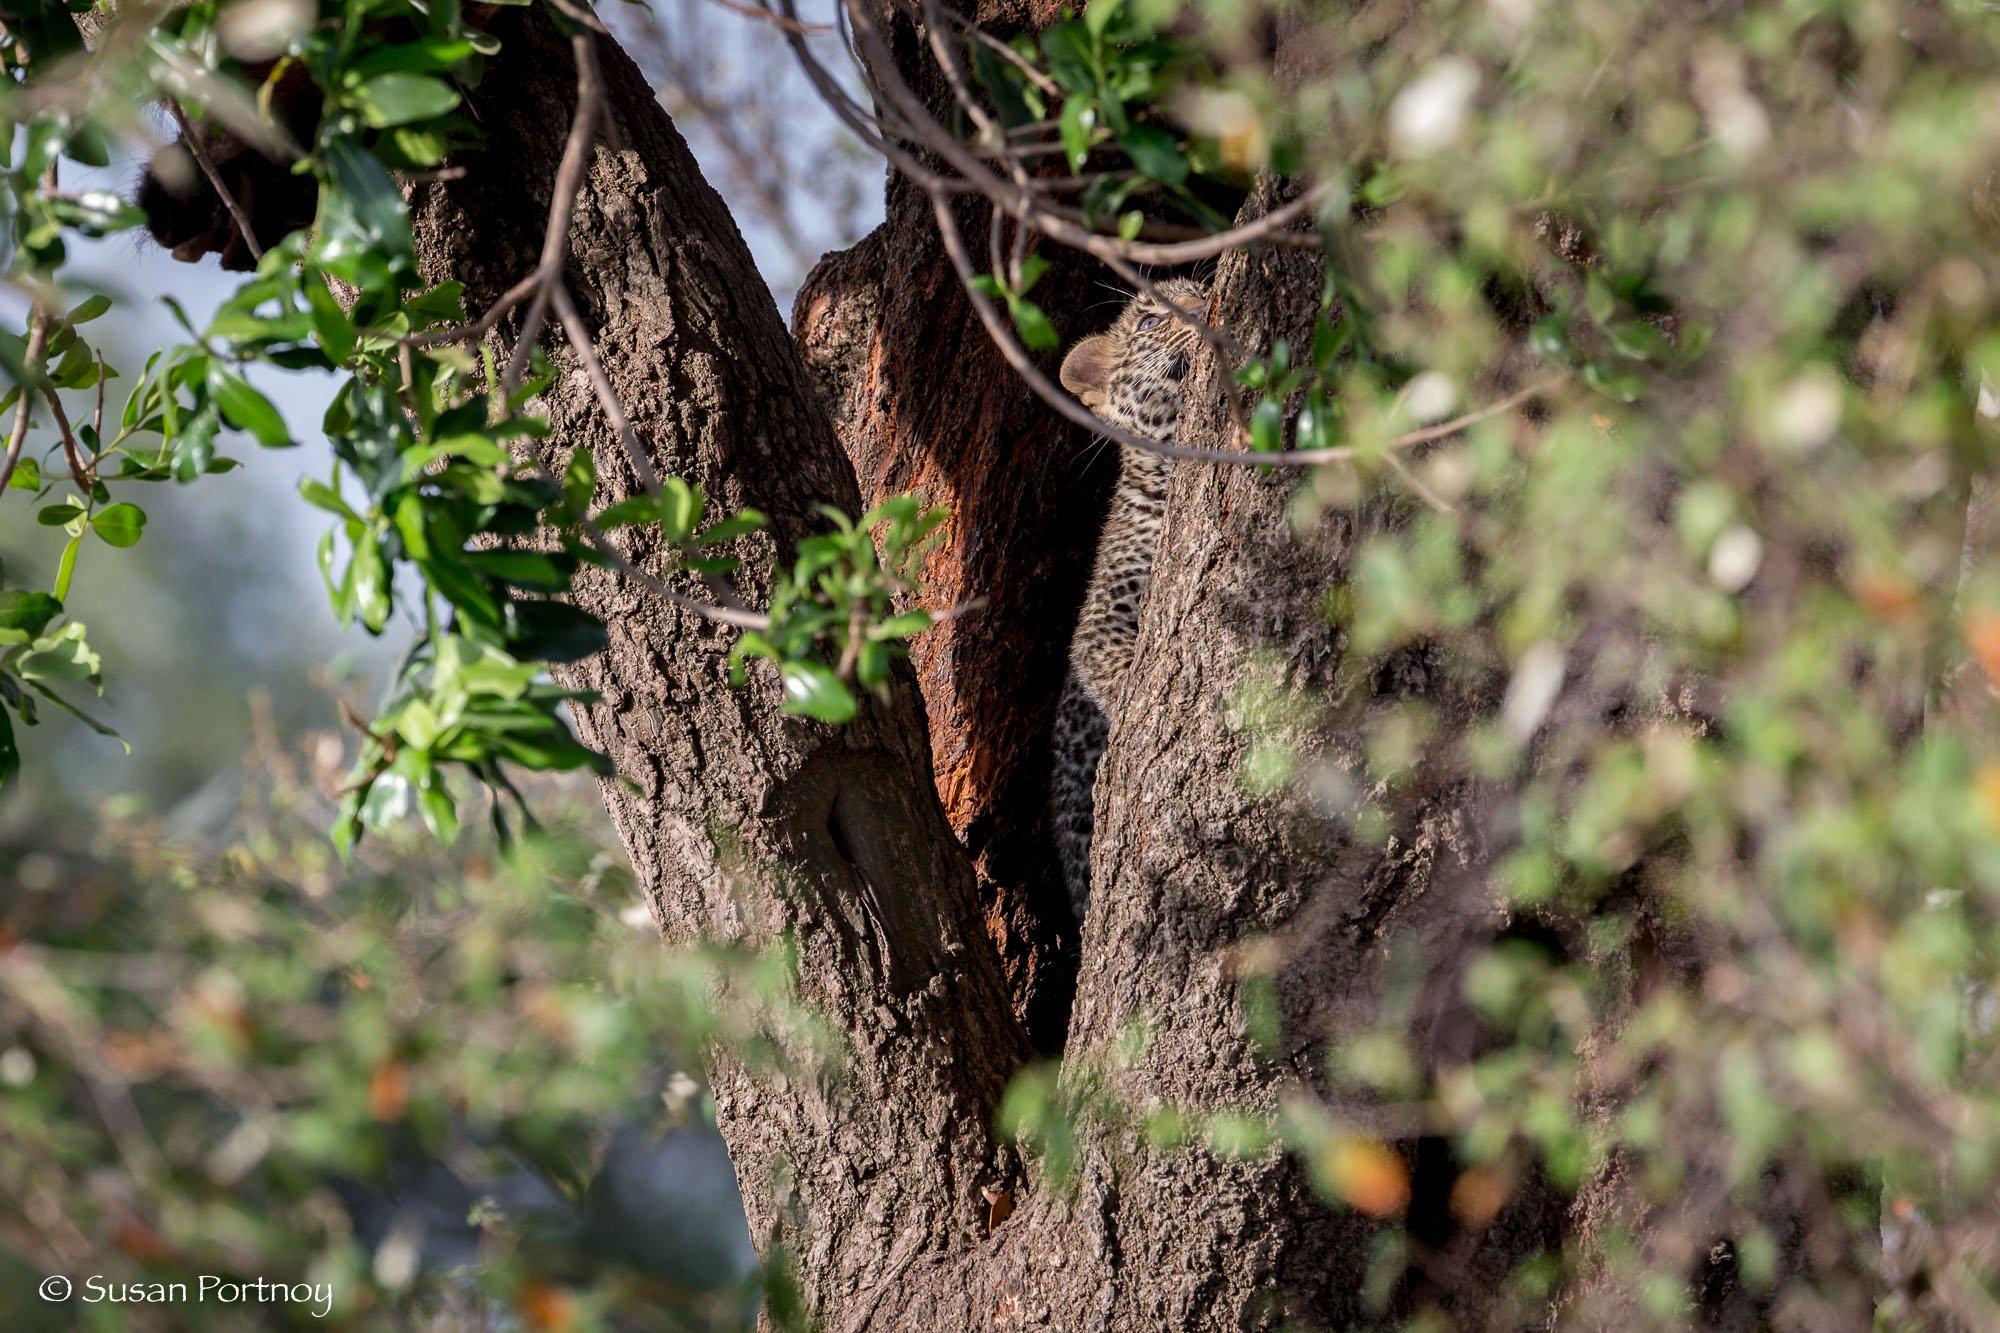 A baby leopard climbing a tree in Kenya